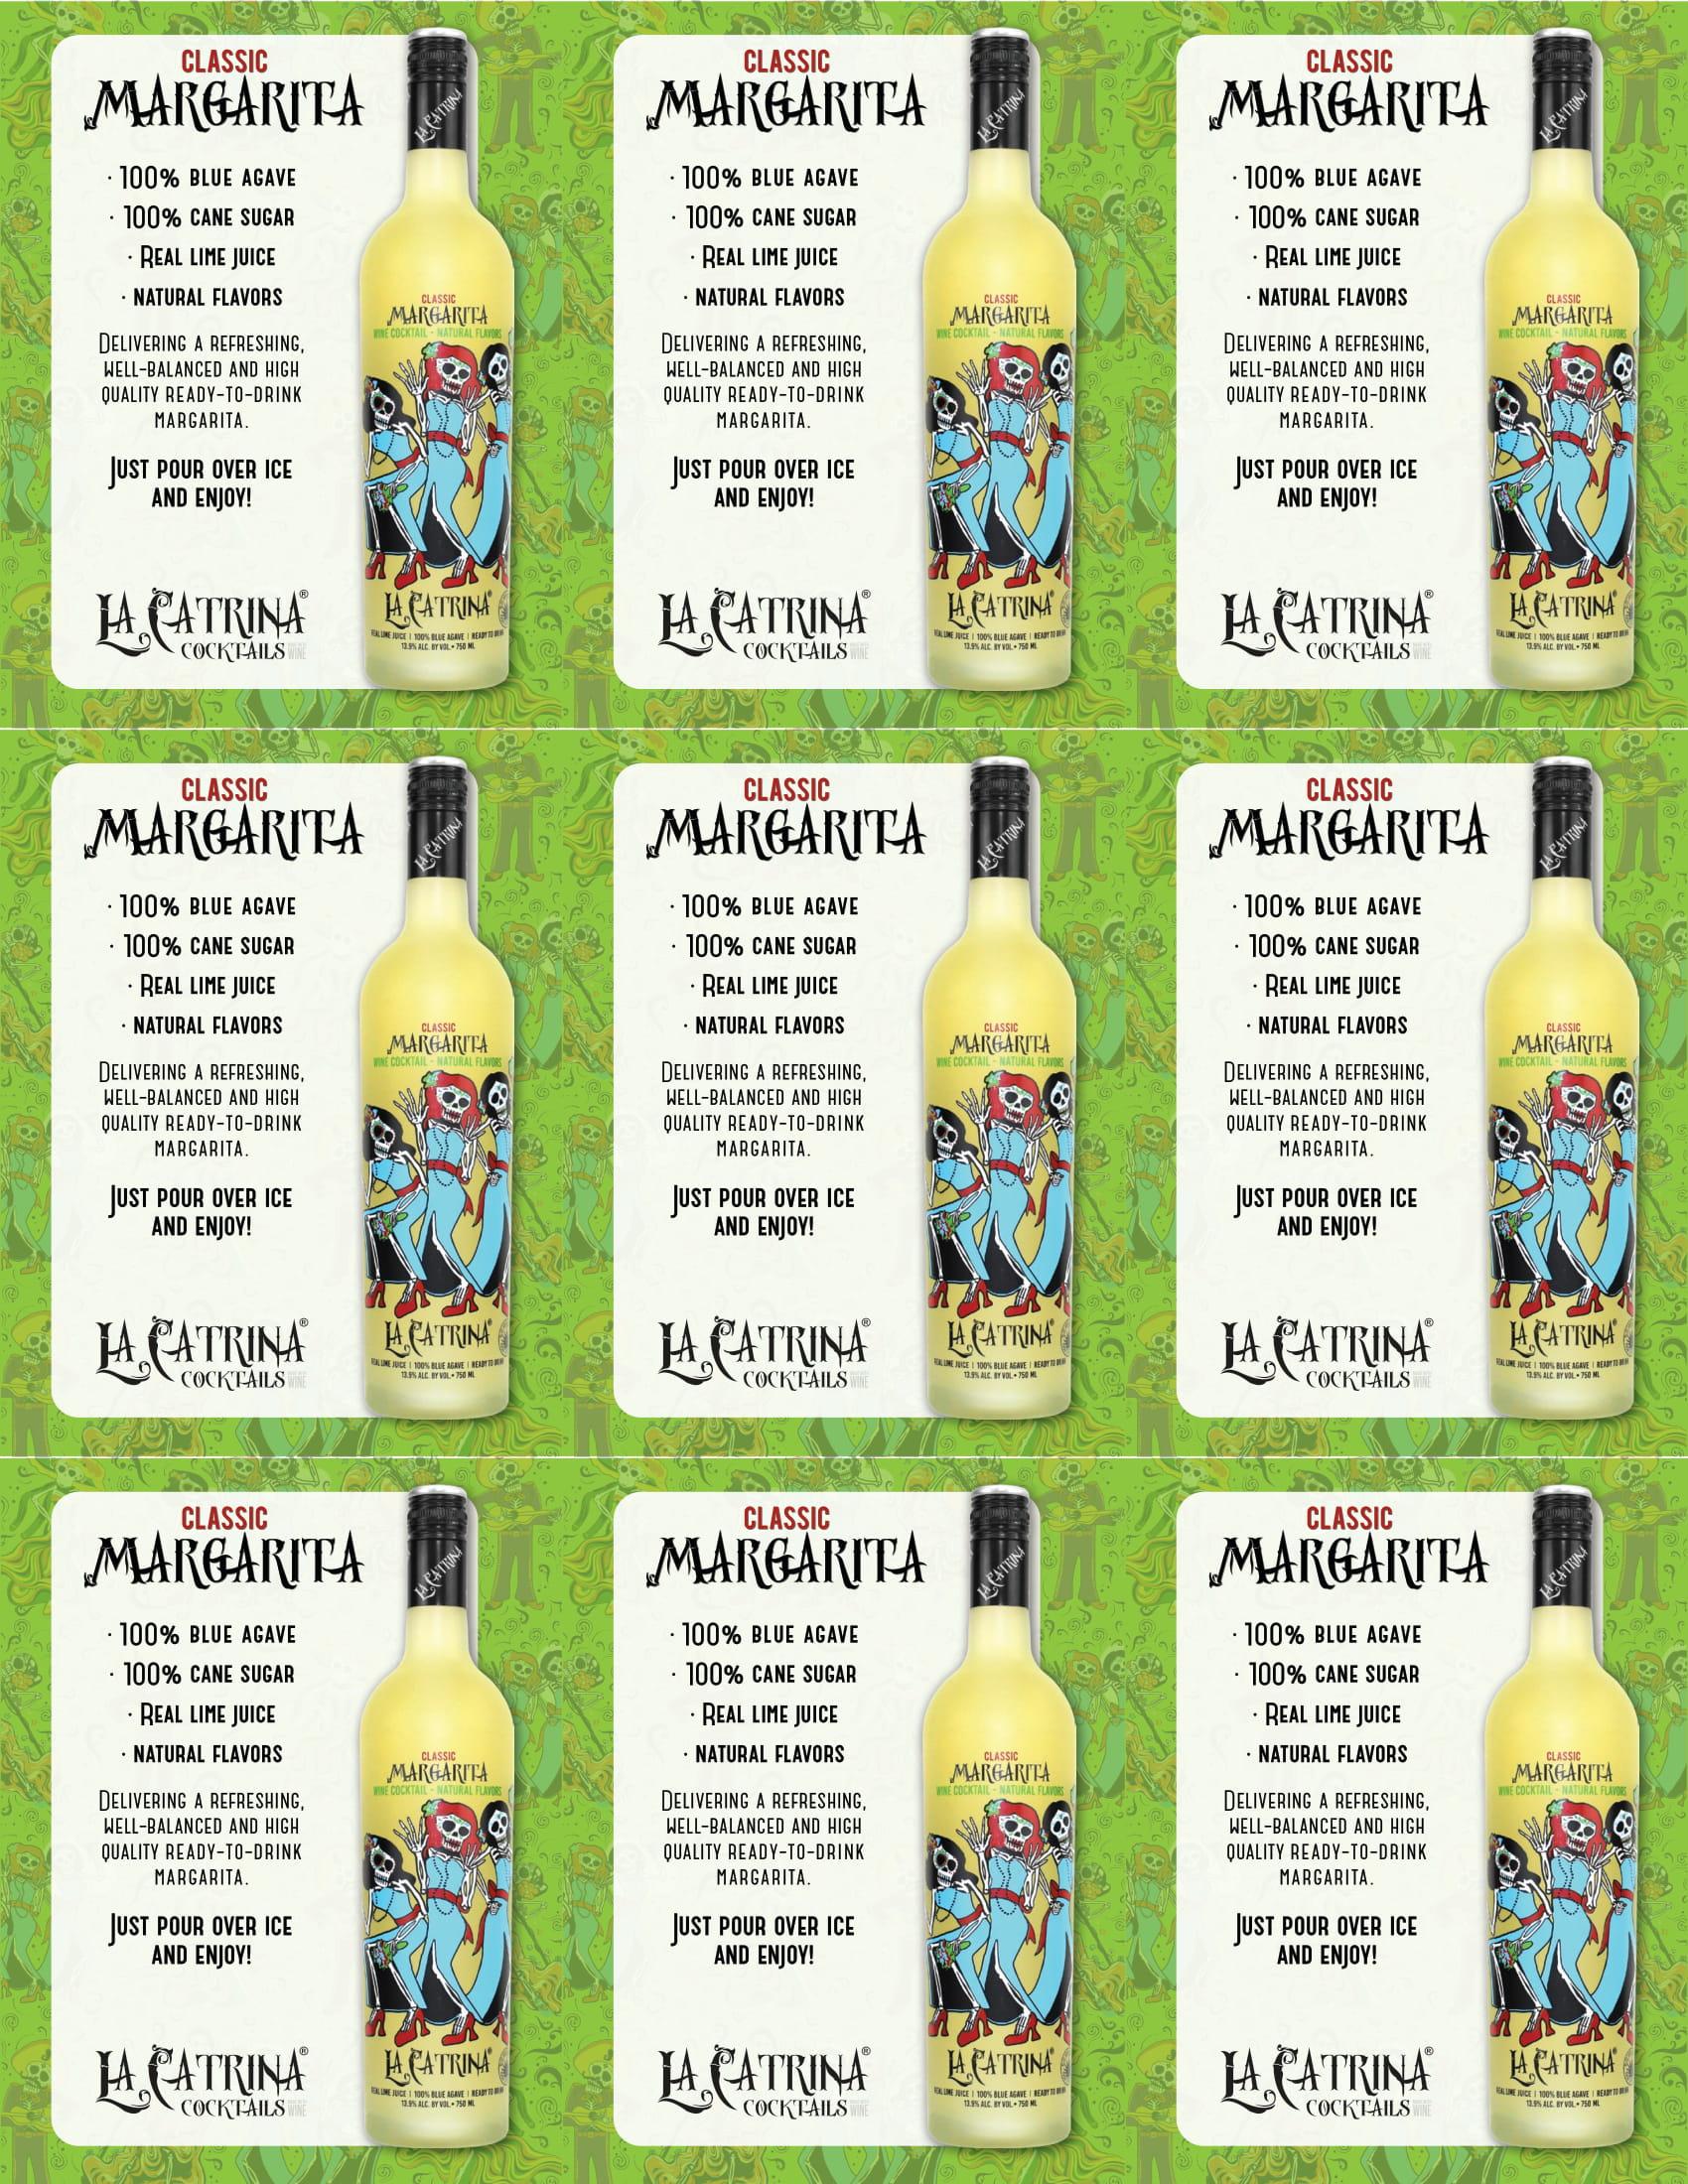 La Catrina Cocktails Classic Margarita Shelf Talkers